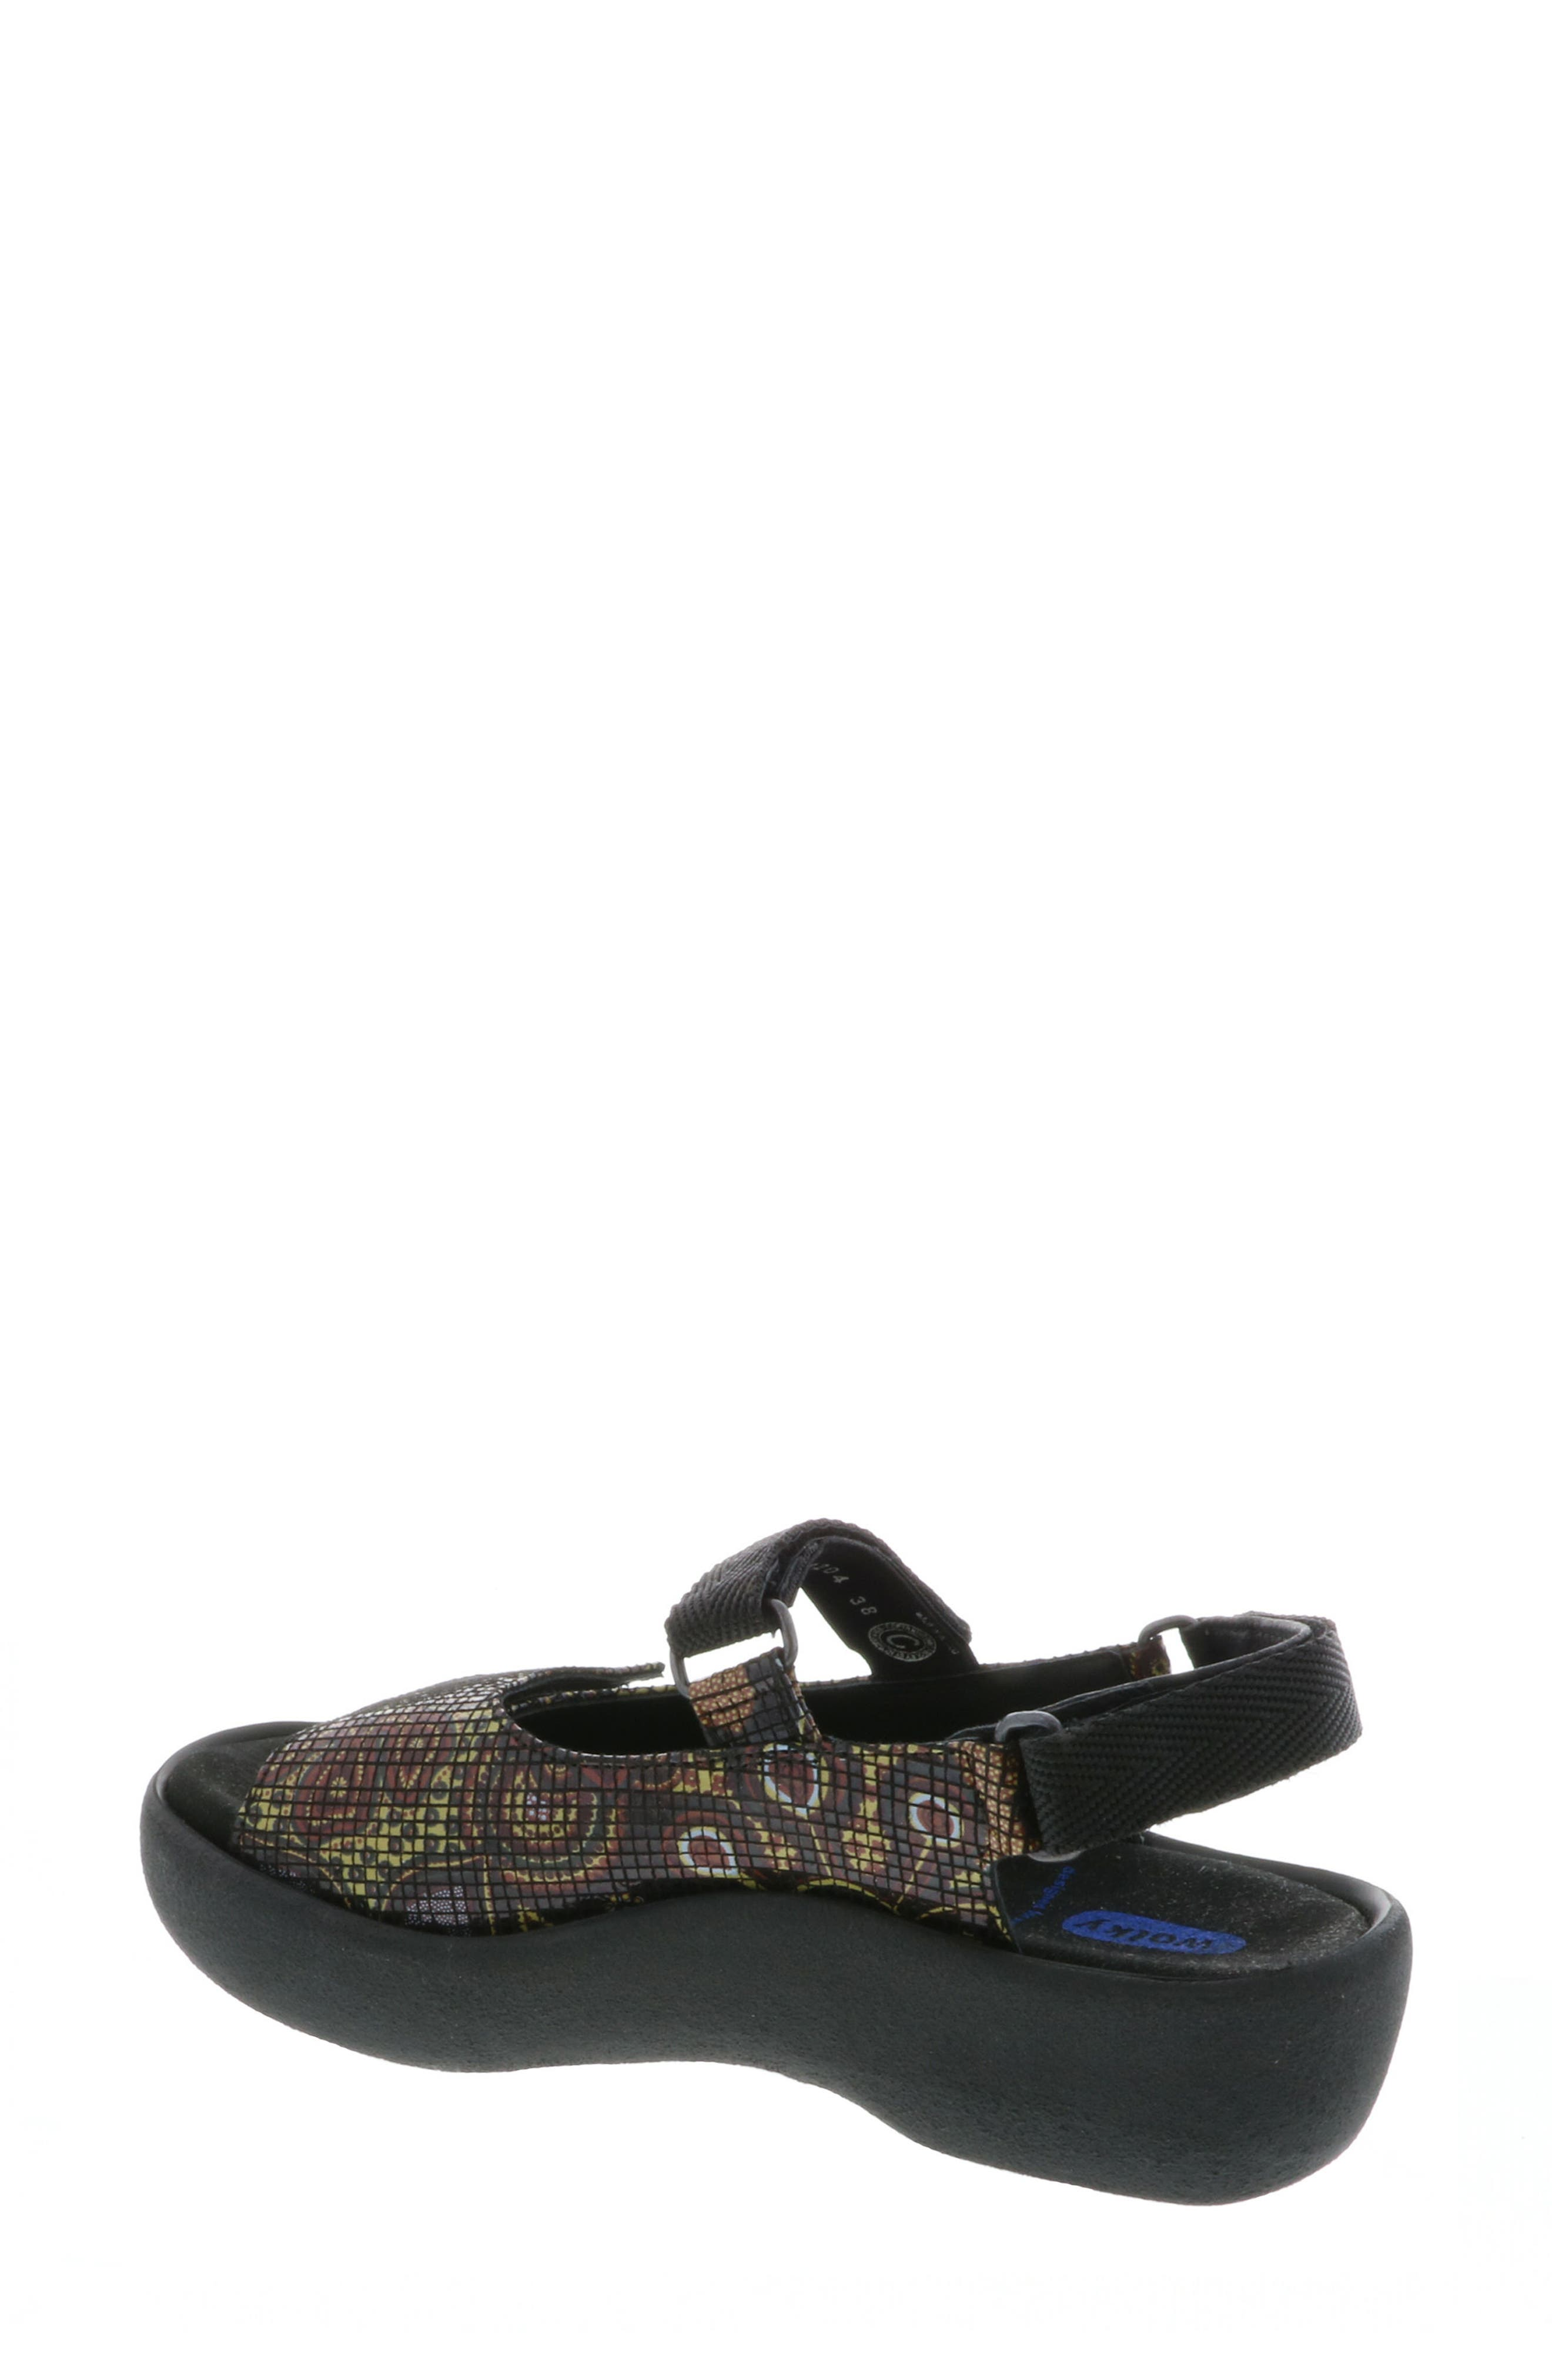 Jewel Sport Sandal,                             Alternate thumbnail 2, color,                             Black Flower Print